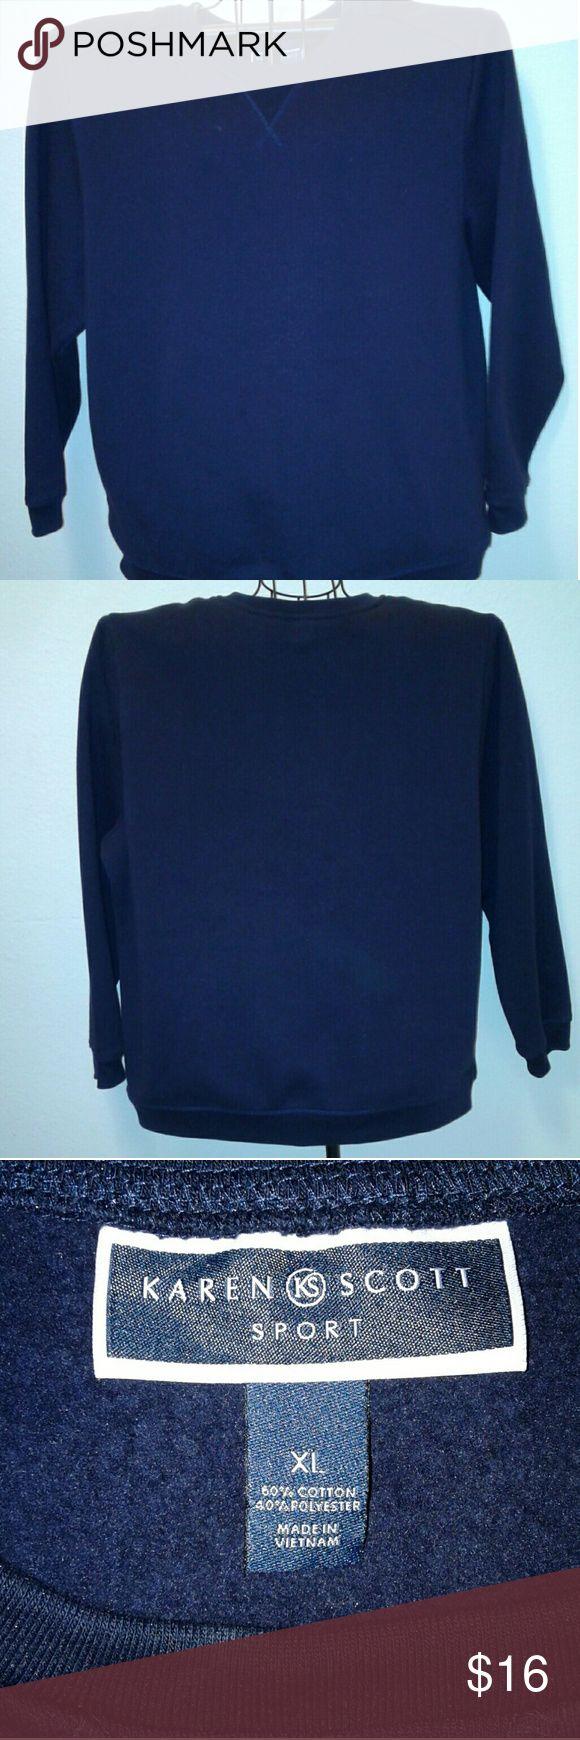 """KAREN SCOTT"" pull over sweat-shirt, XL, navy blue New WithOut Tags, XL, Ladies navy blue pull-over sweat-shirt sweater, crew neck, navy blue, long sleeves, new condition hasn't been worn, no tags, made inVietnam, 60% cotton, 40% polyester, very soft inside. Original retail- $29.00 WPL#8046 Karen Scott Sweaters Crew & Scoop Necks"